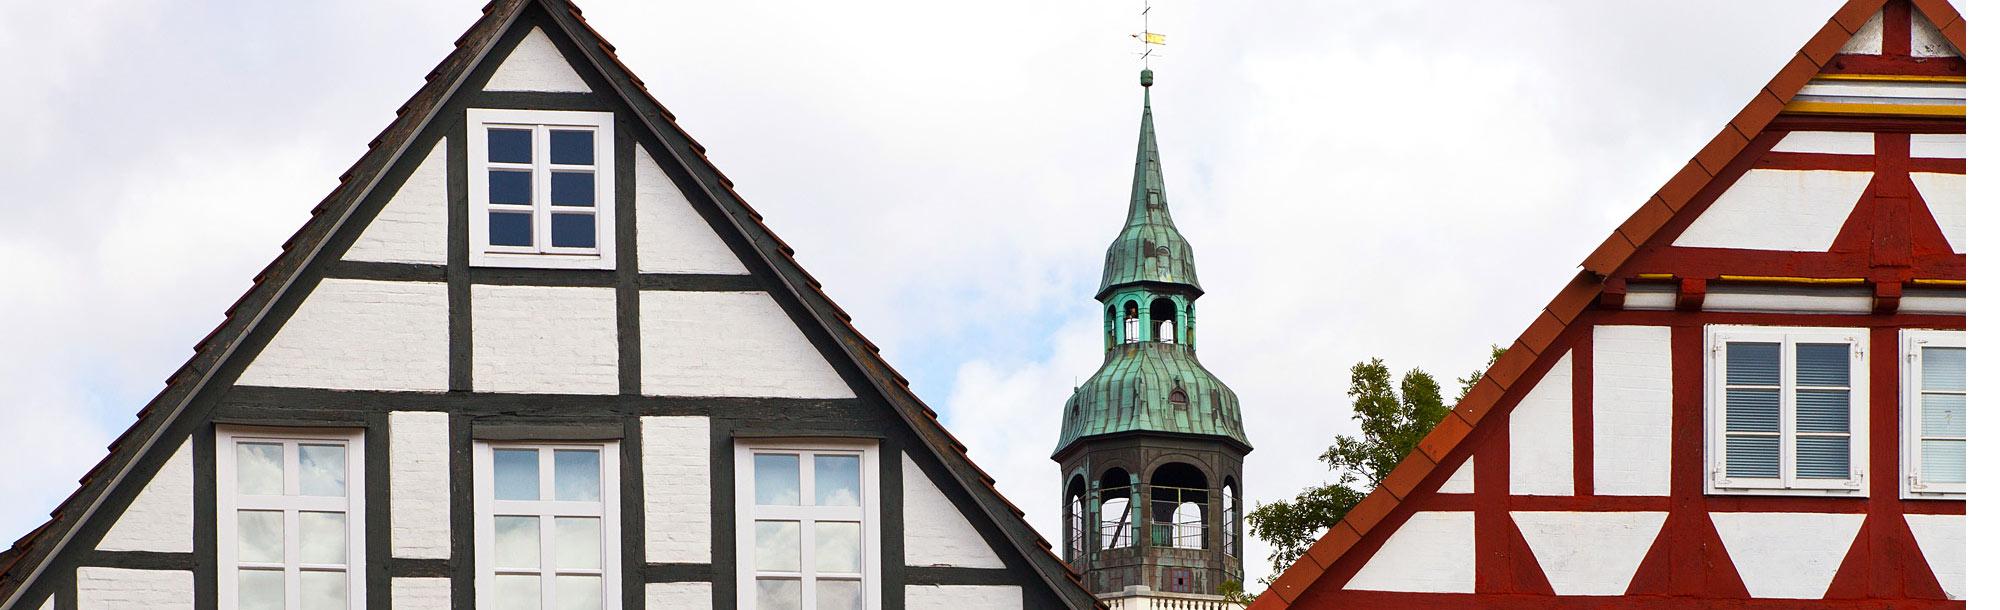 Die Altstadt und Umgebung